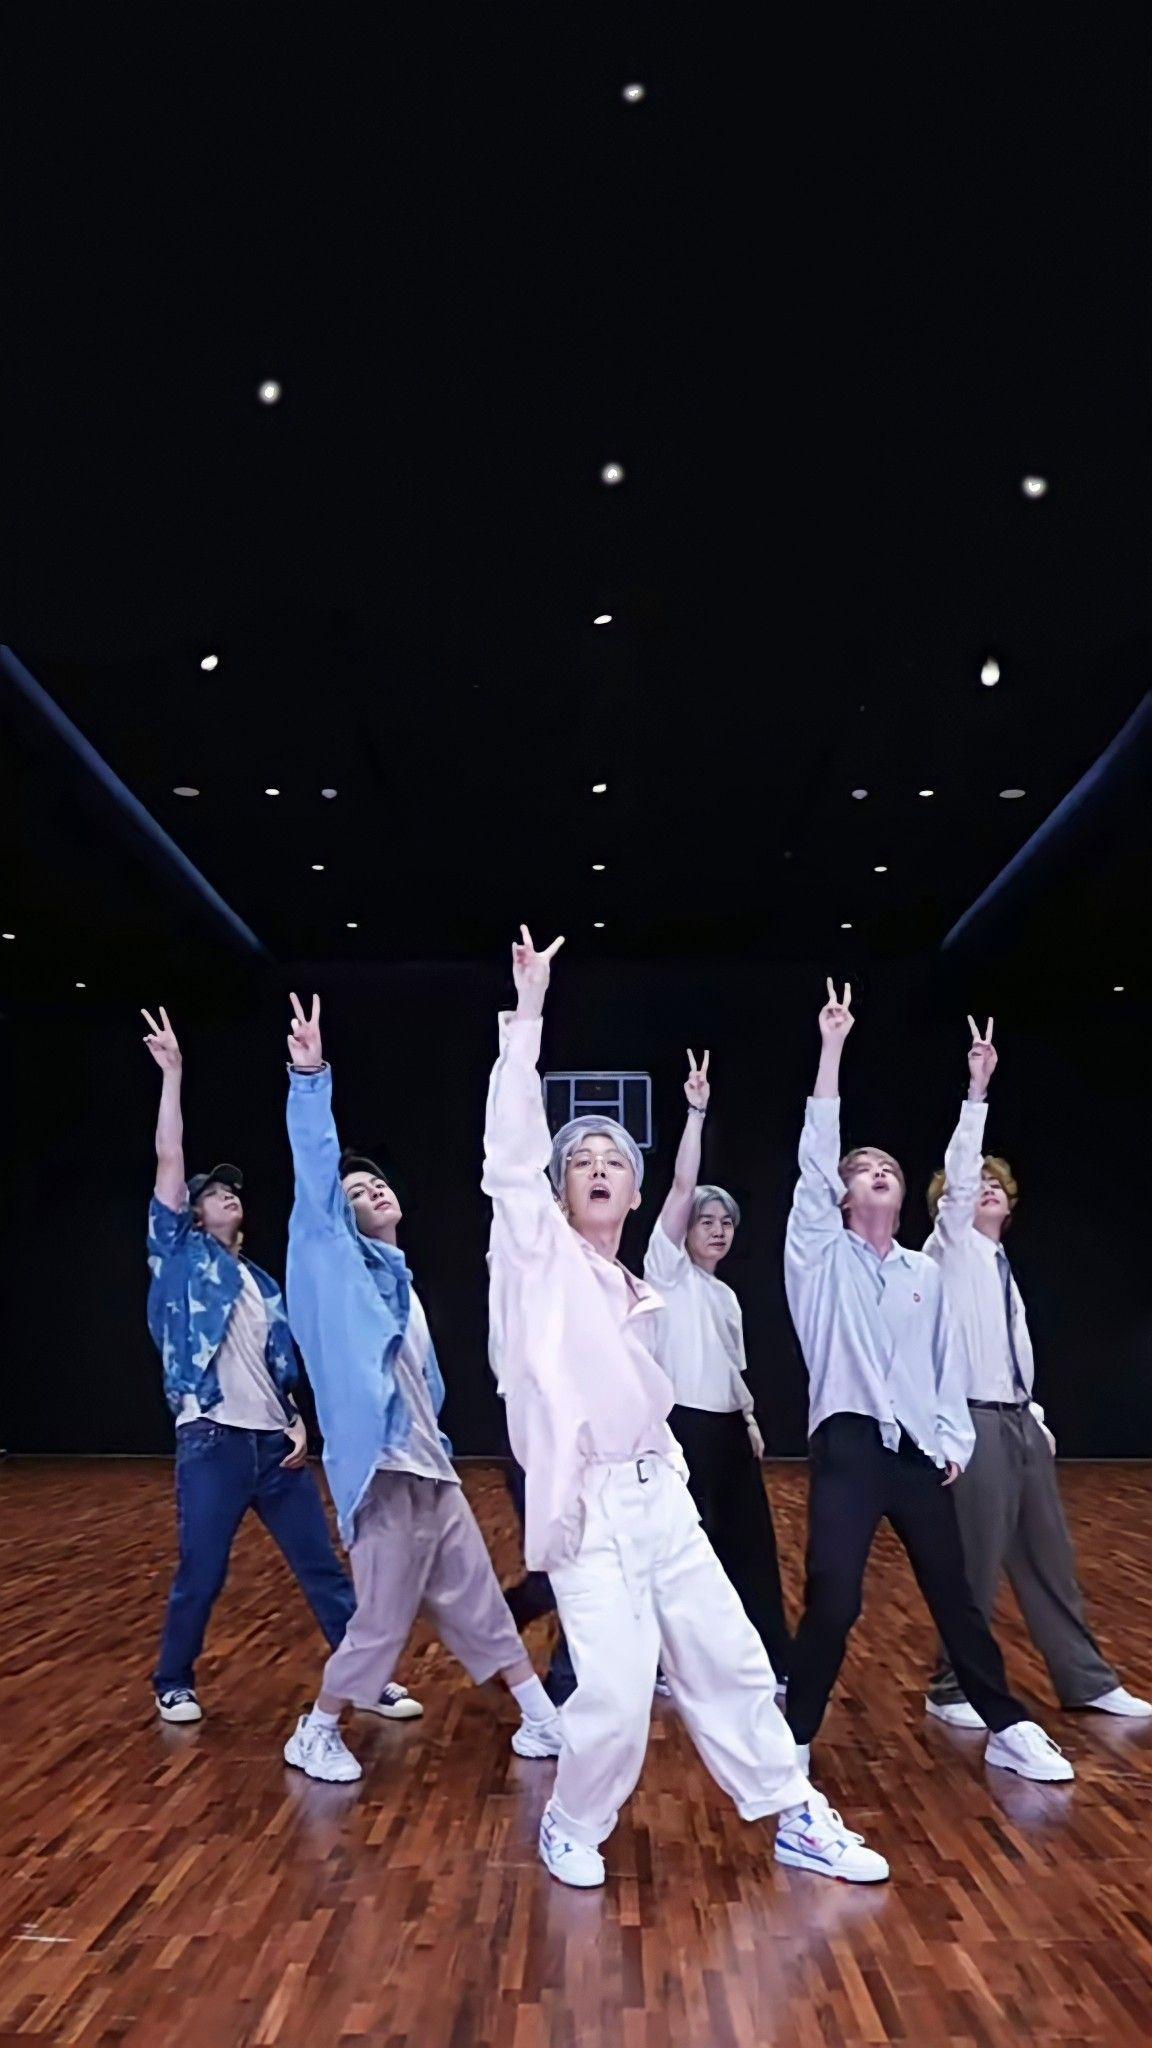 Choreography Bts Permission To Dance Dance Practice In 2021 Foto Bts Bts Imagine Bts Boys Bts wallpaper 2021 permission to dance